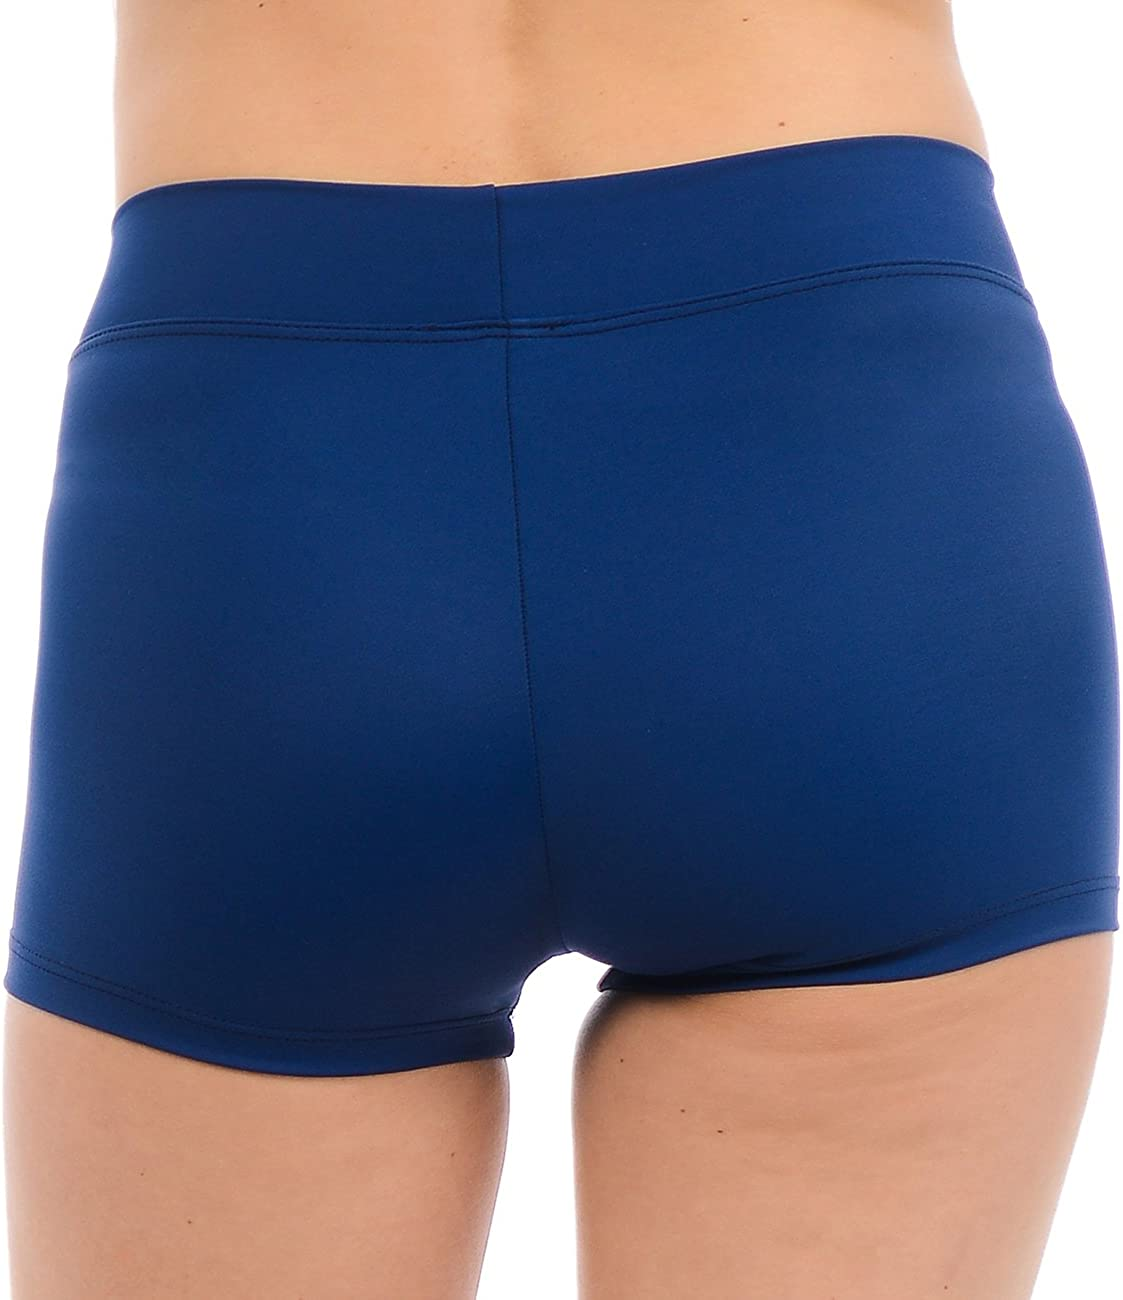 Anza Girls Activewear Dance Booty Shorts Gym Workout Yoga Shorts